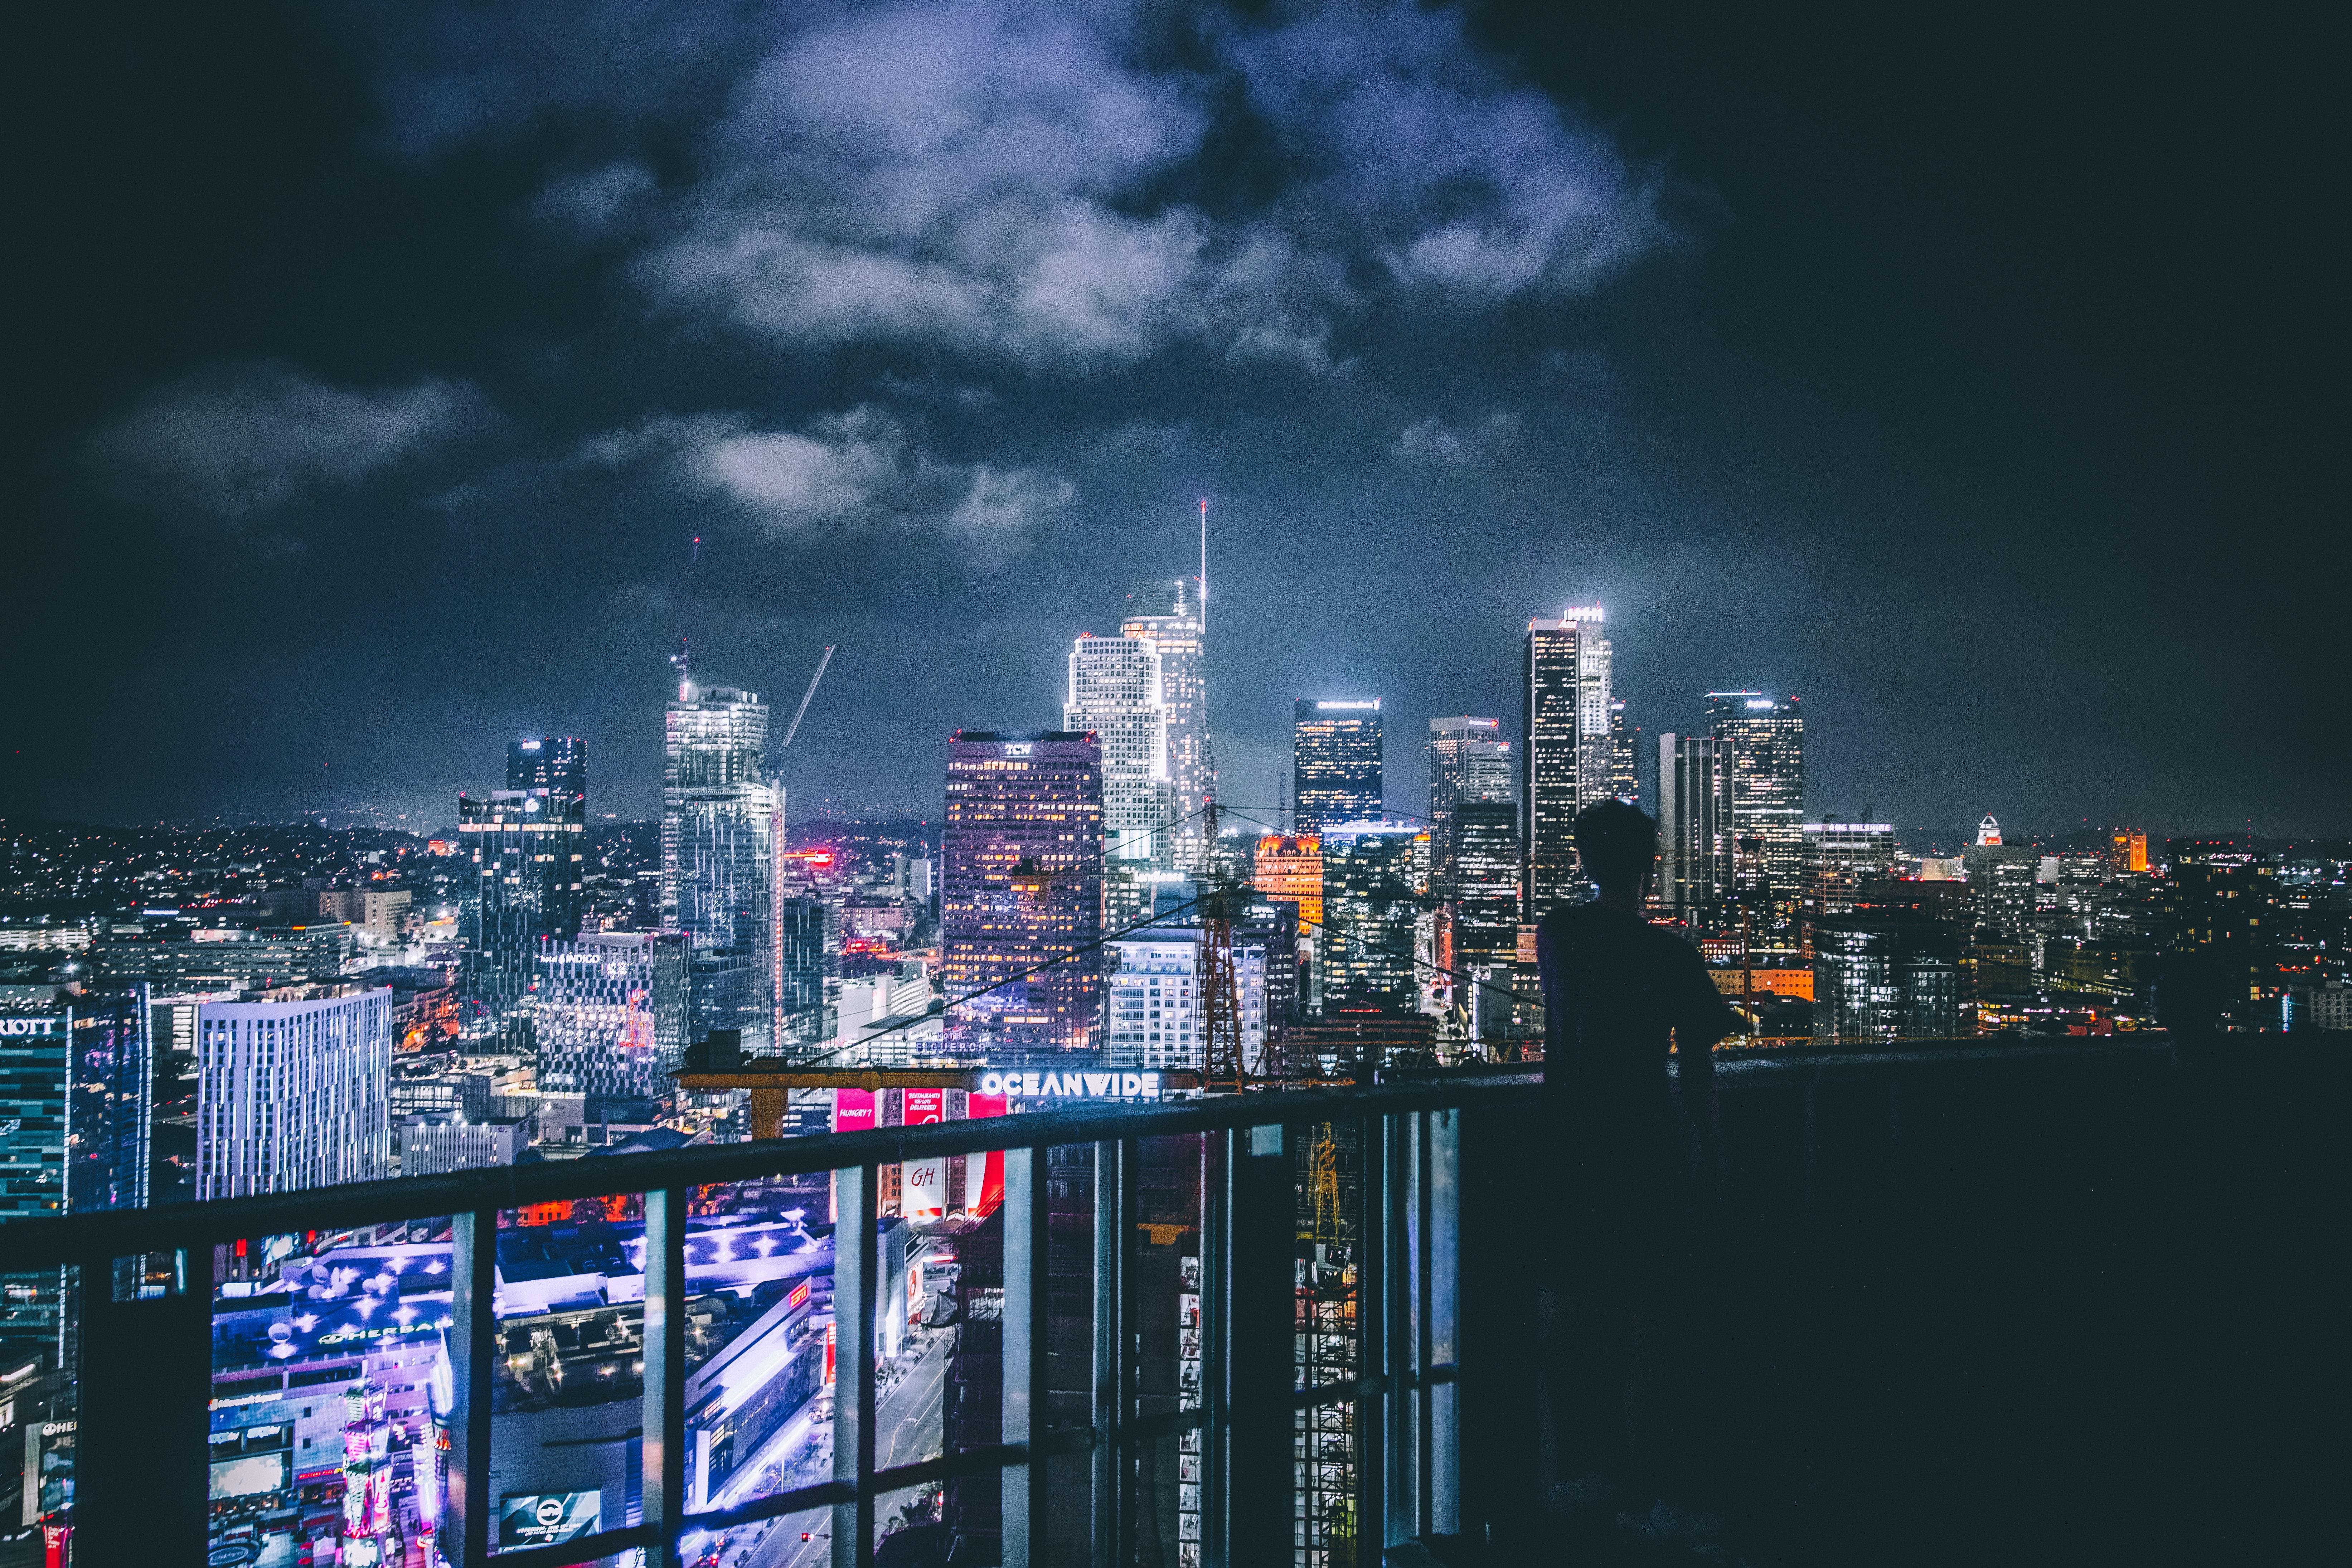 LA Nightlife